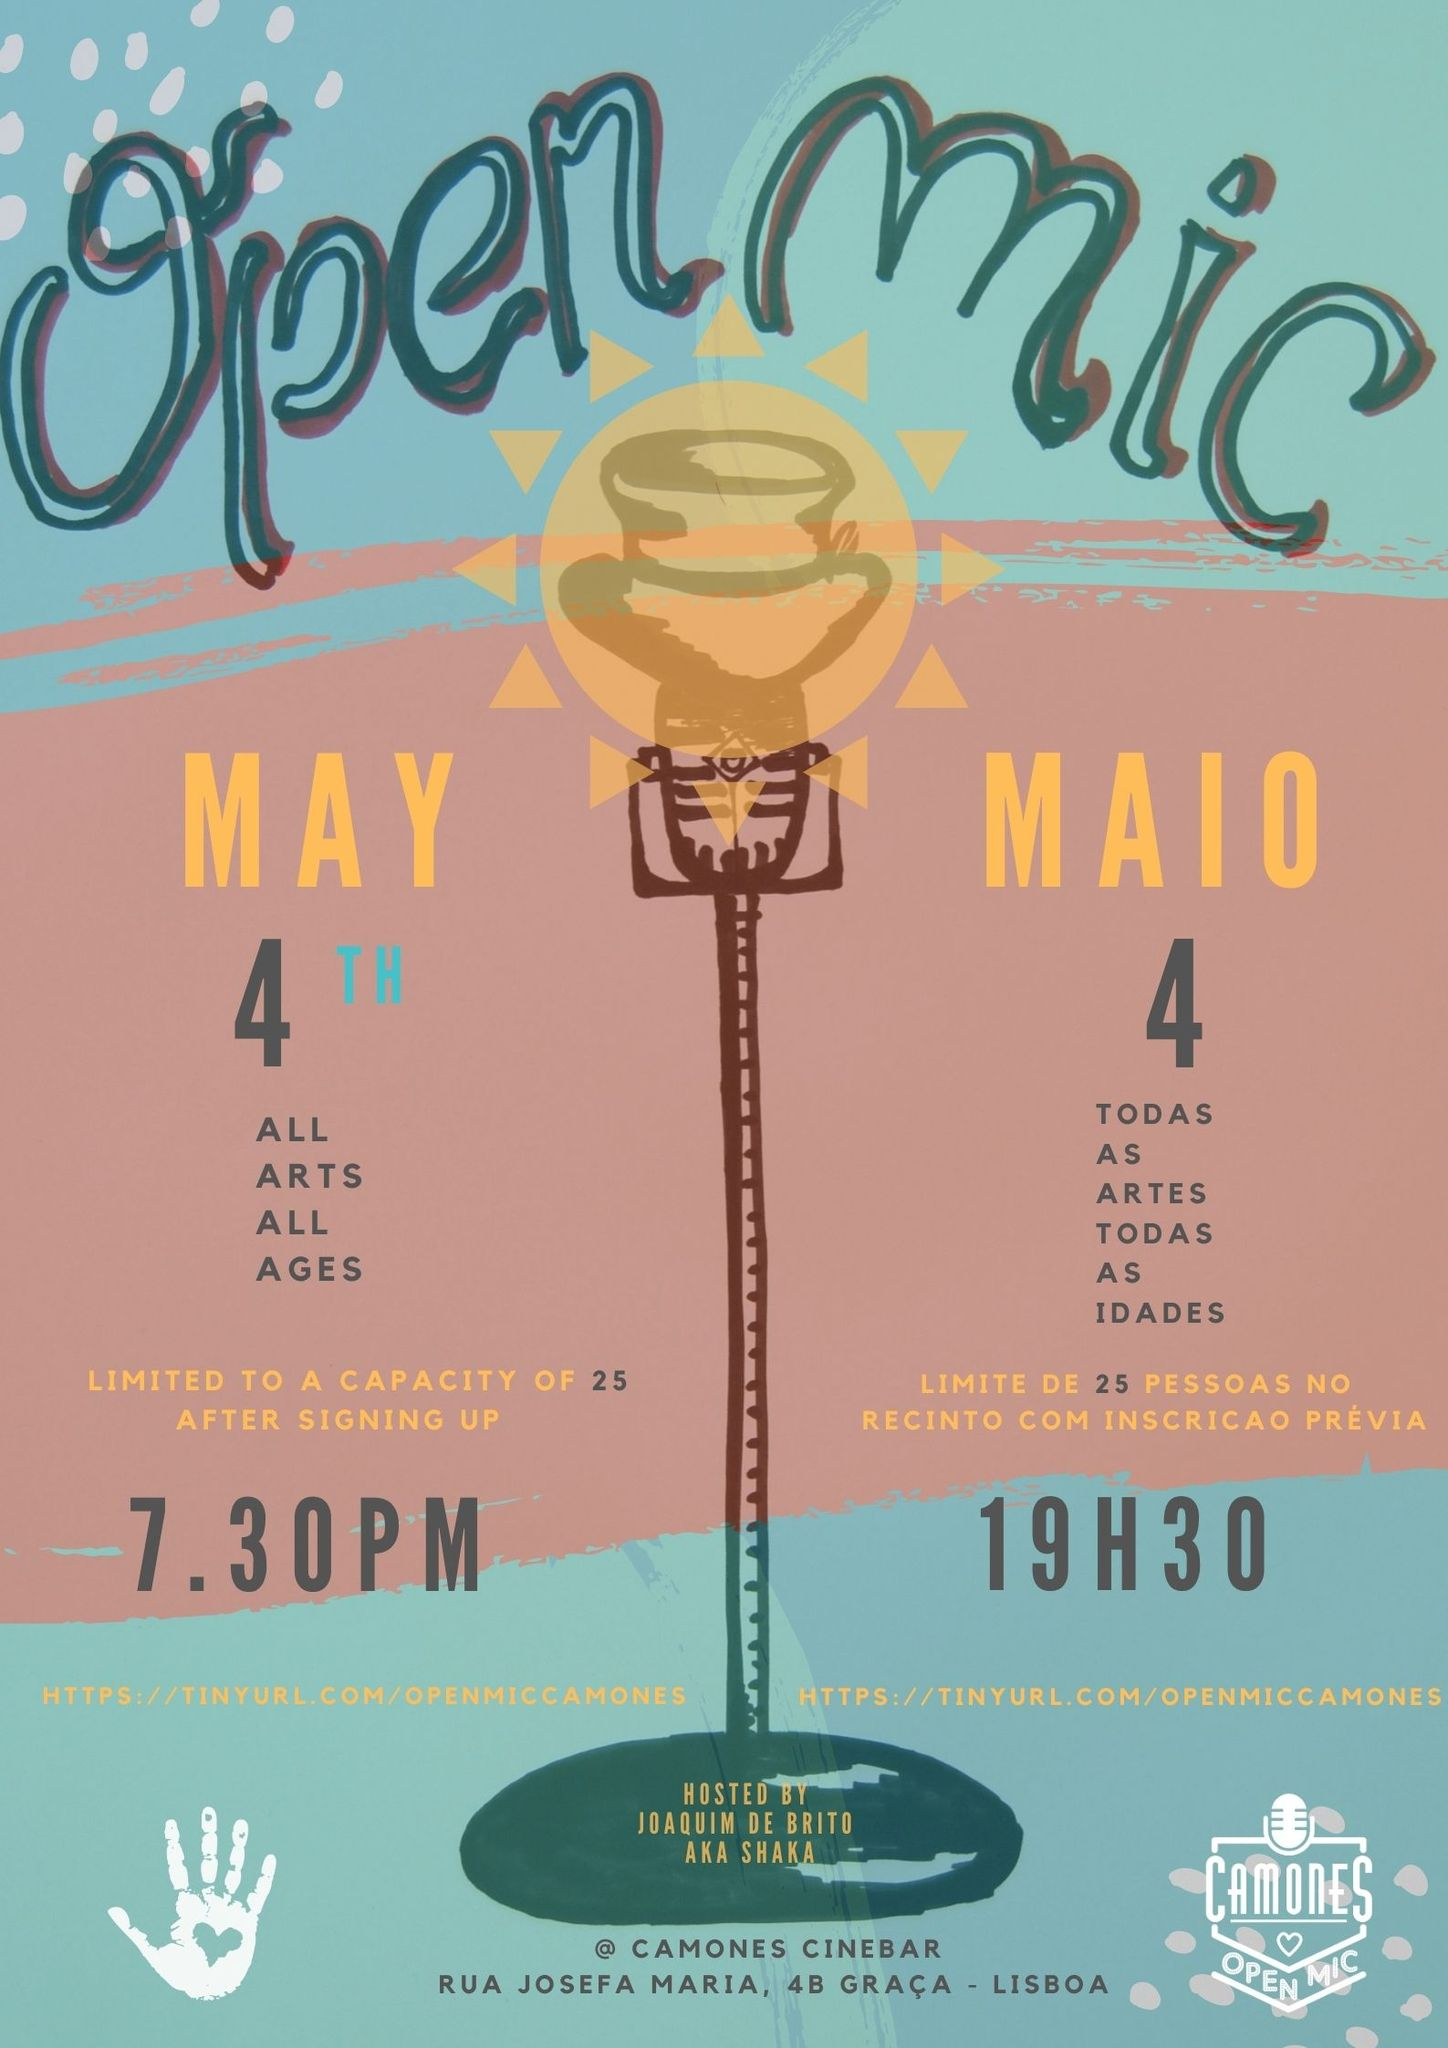 Open Mic - 65ª edição - All Arts, All Ages